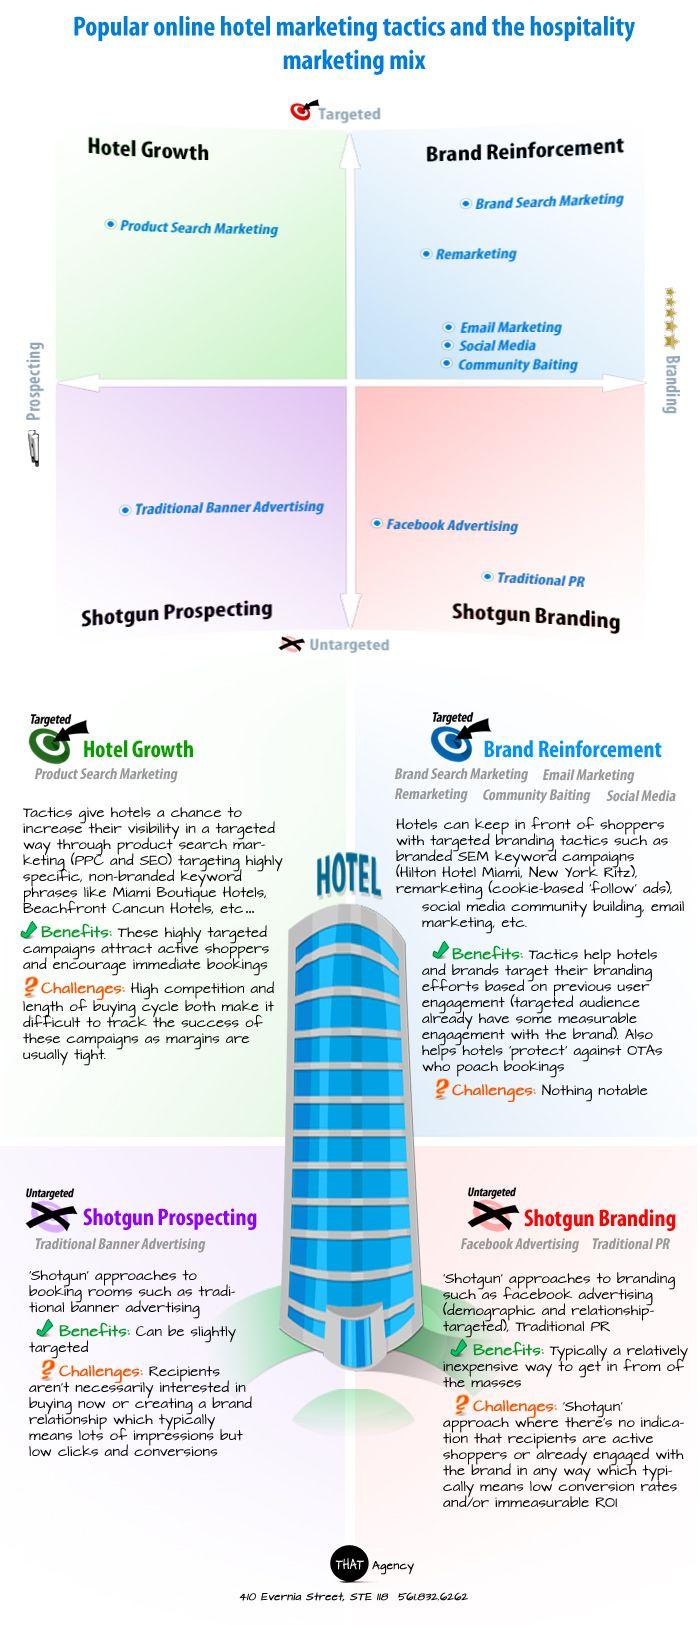 29 best Hotel Marketing images on Pinterest | Internet marketing ...